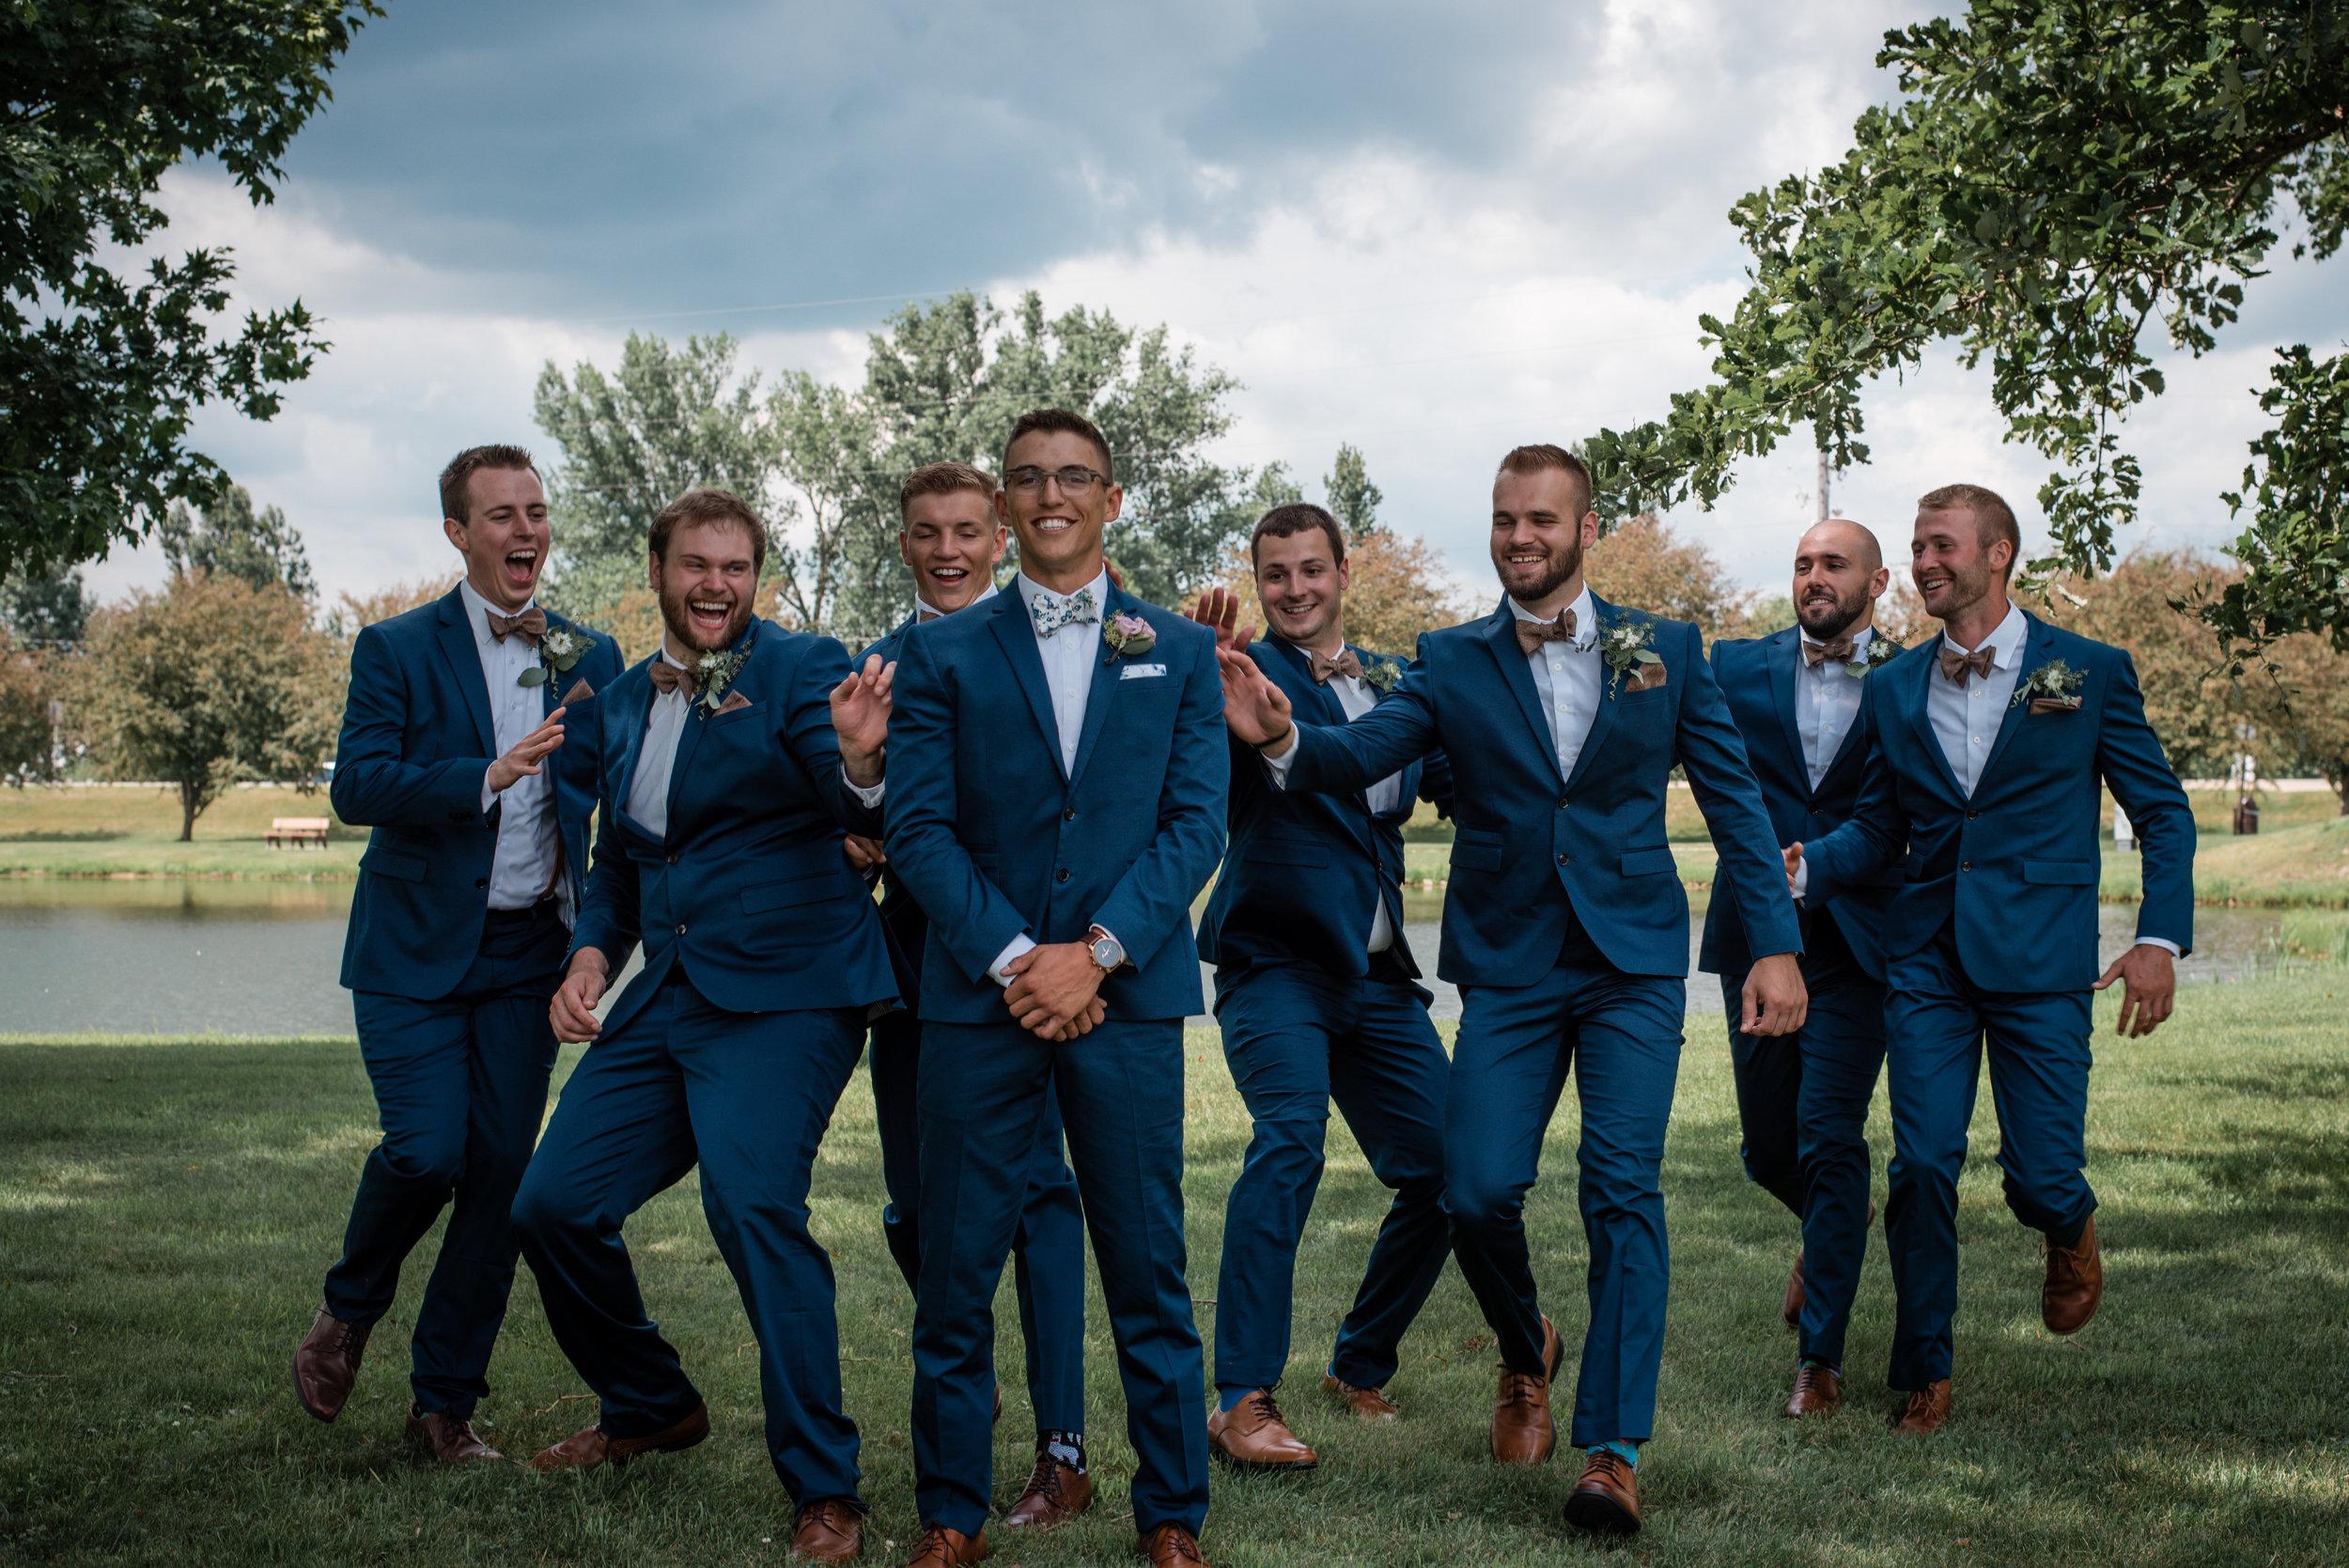 Romantic wedding in Madison wisconsin